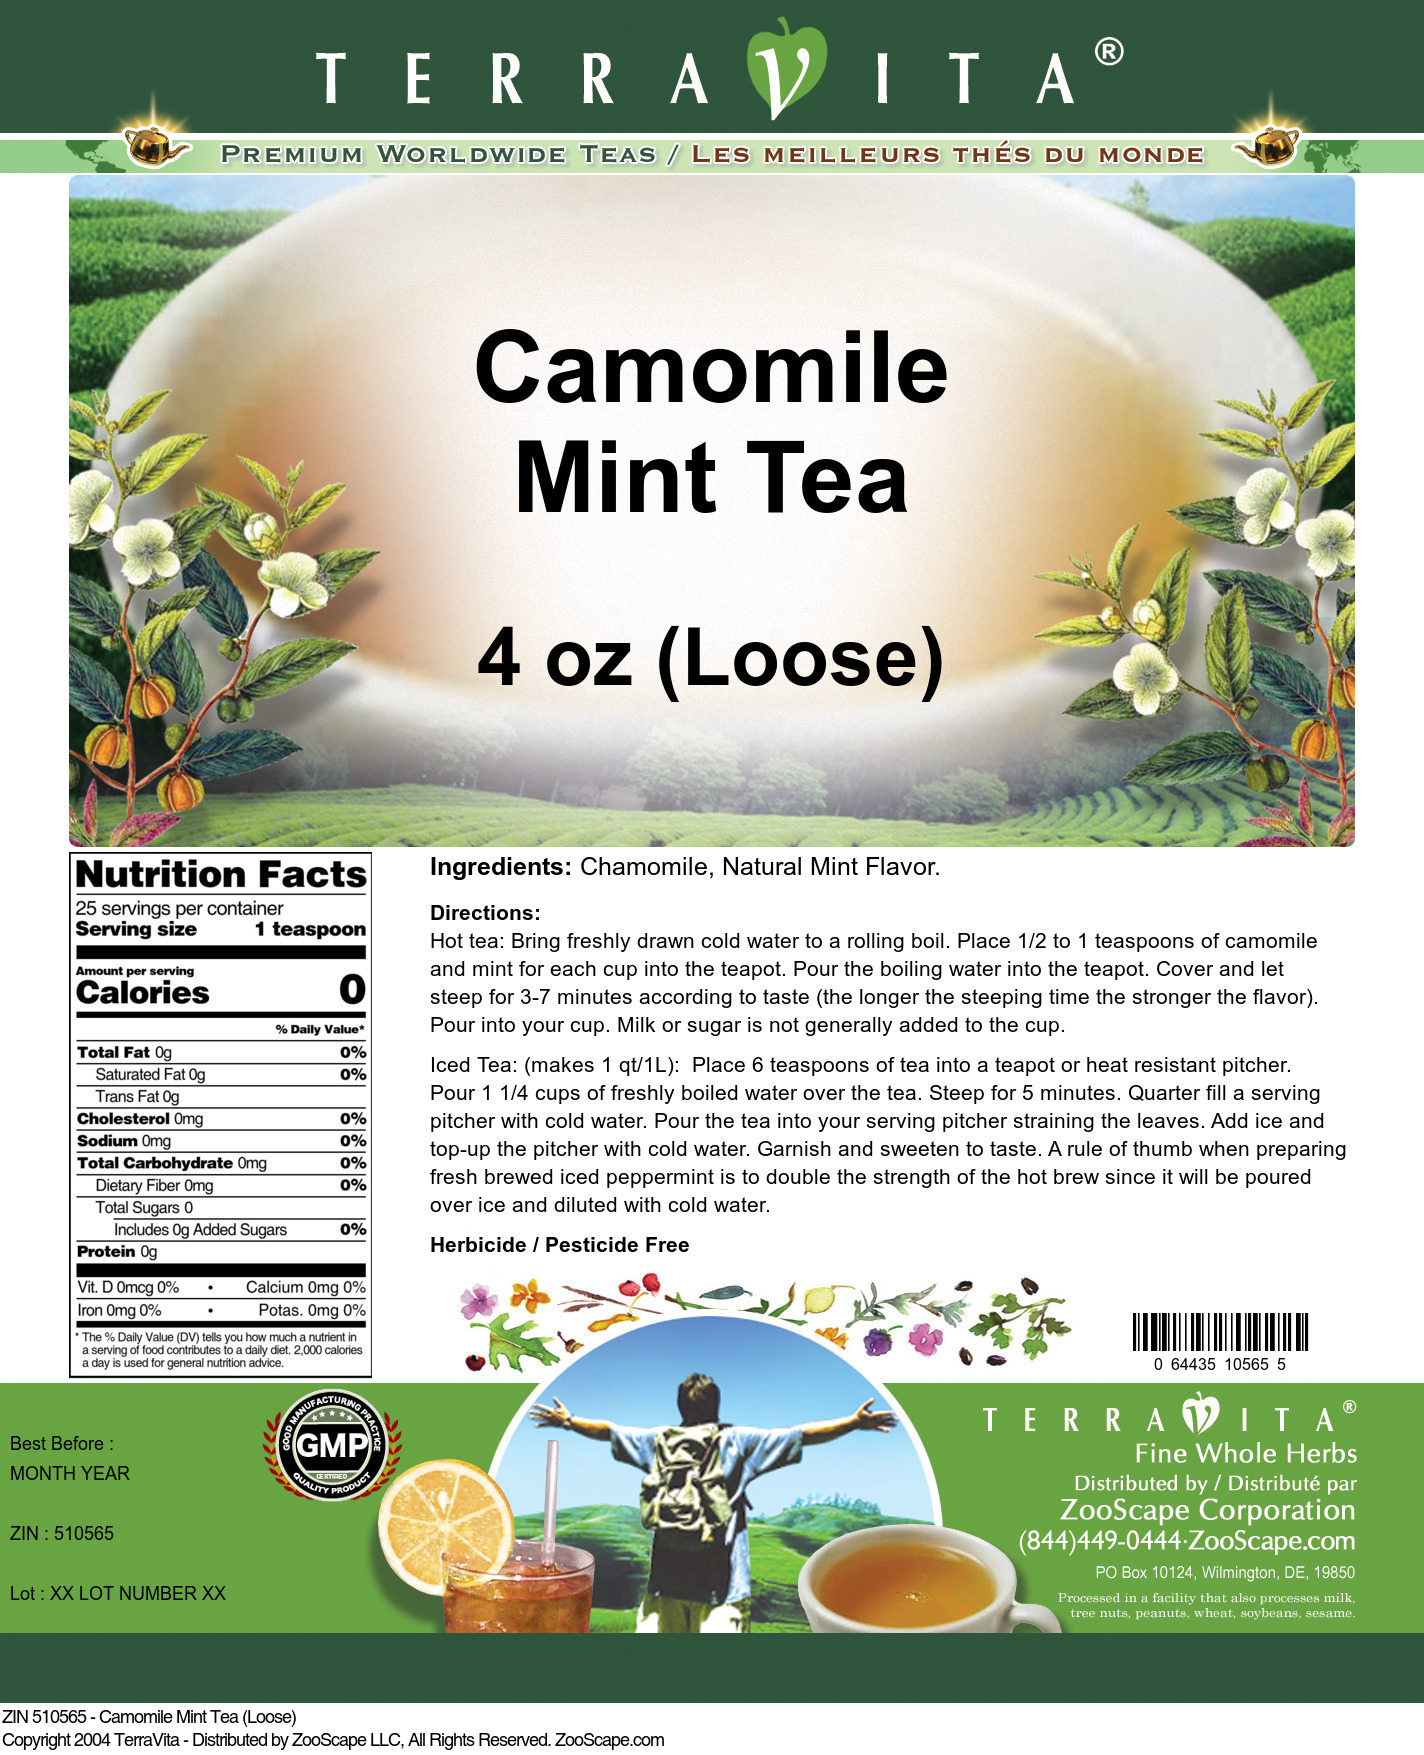 Camomile Mint Tea (Loose)